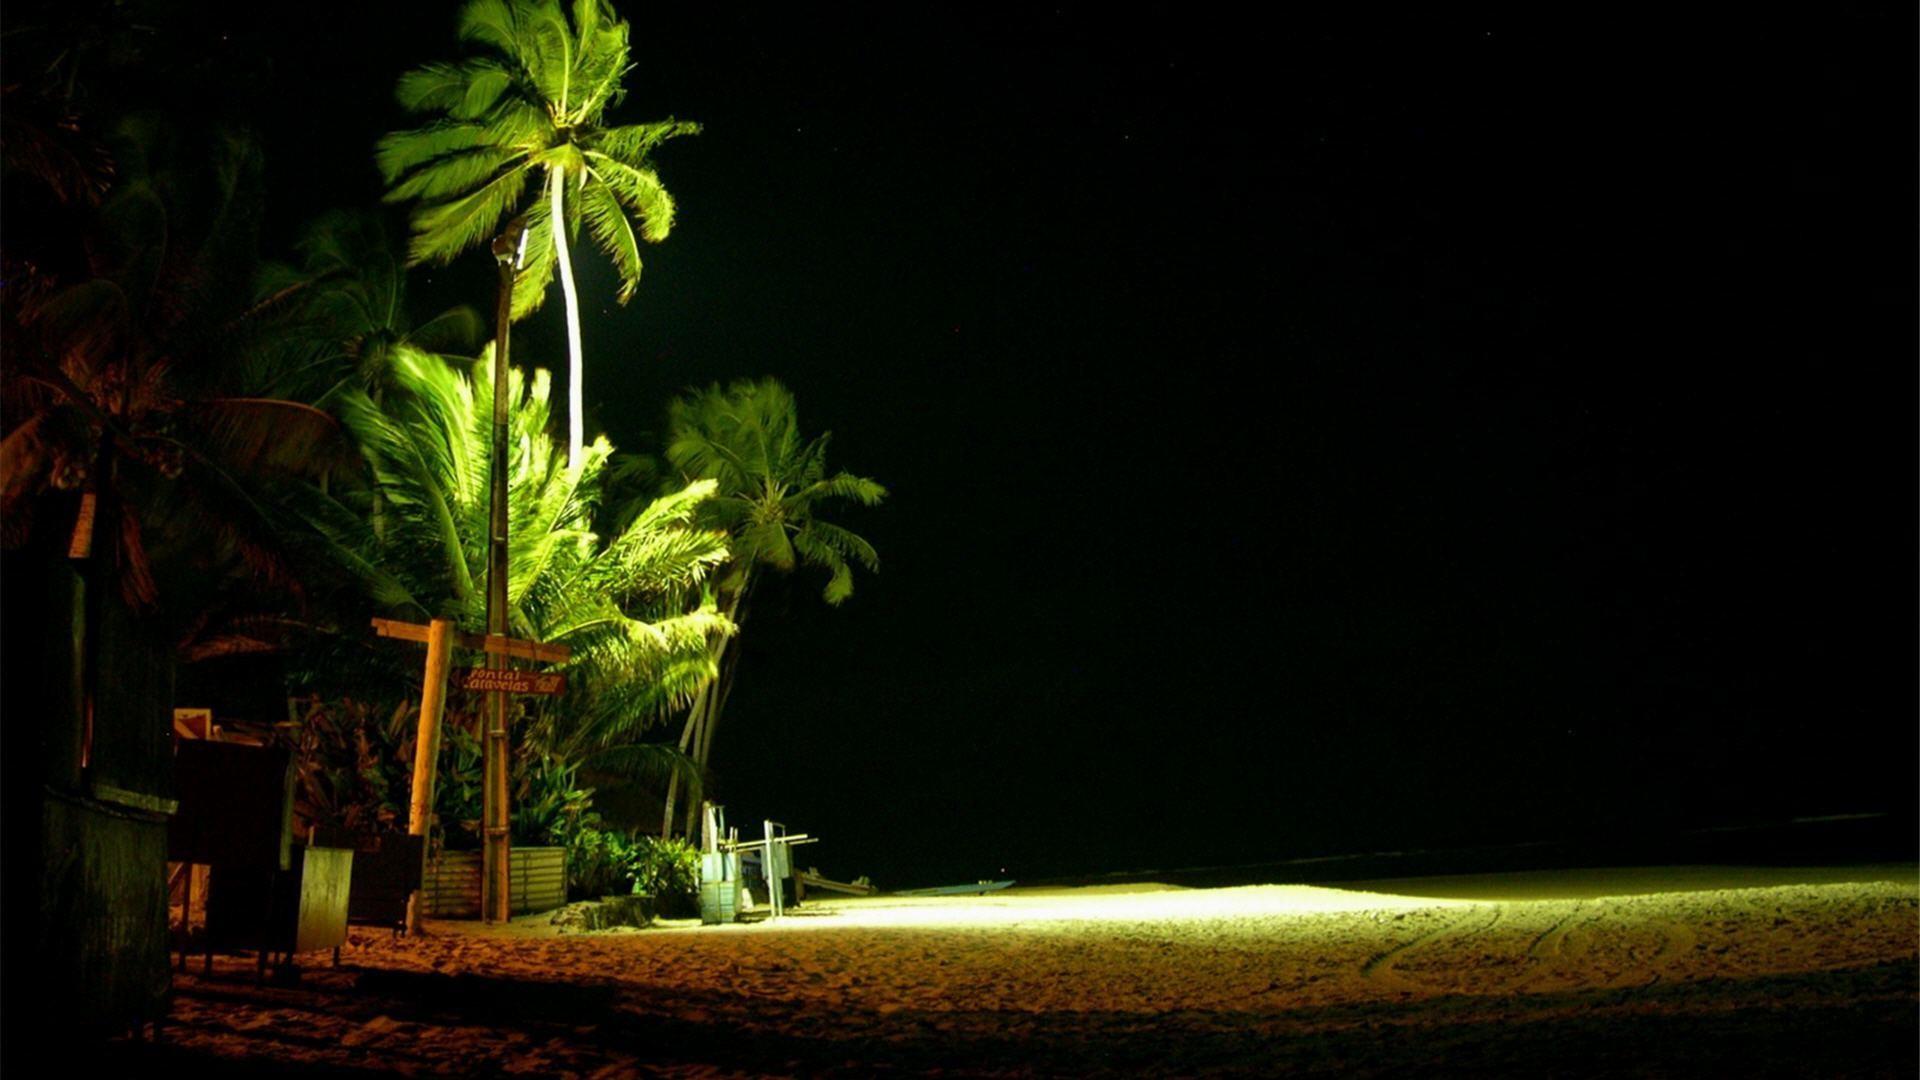 wallpaper.wiki-Beach-At-Night-Desktop-Photos-PIC-